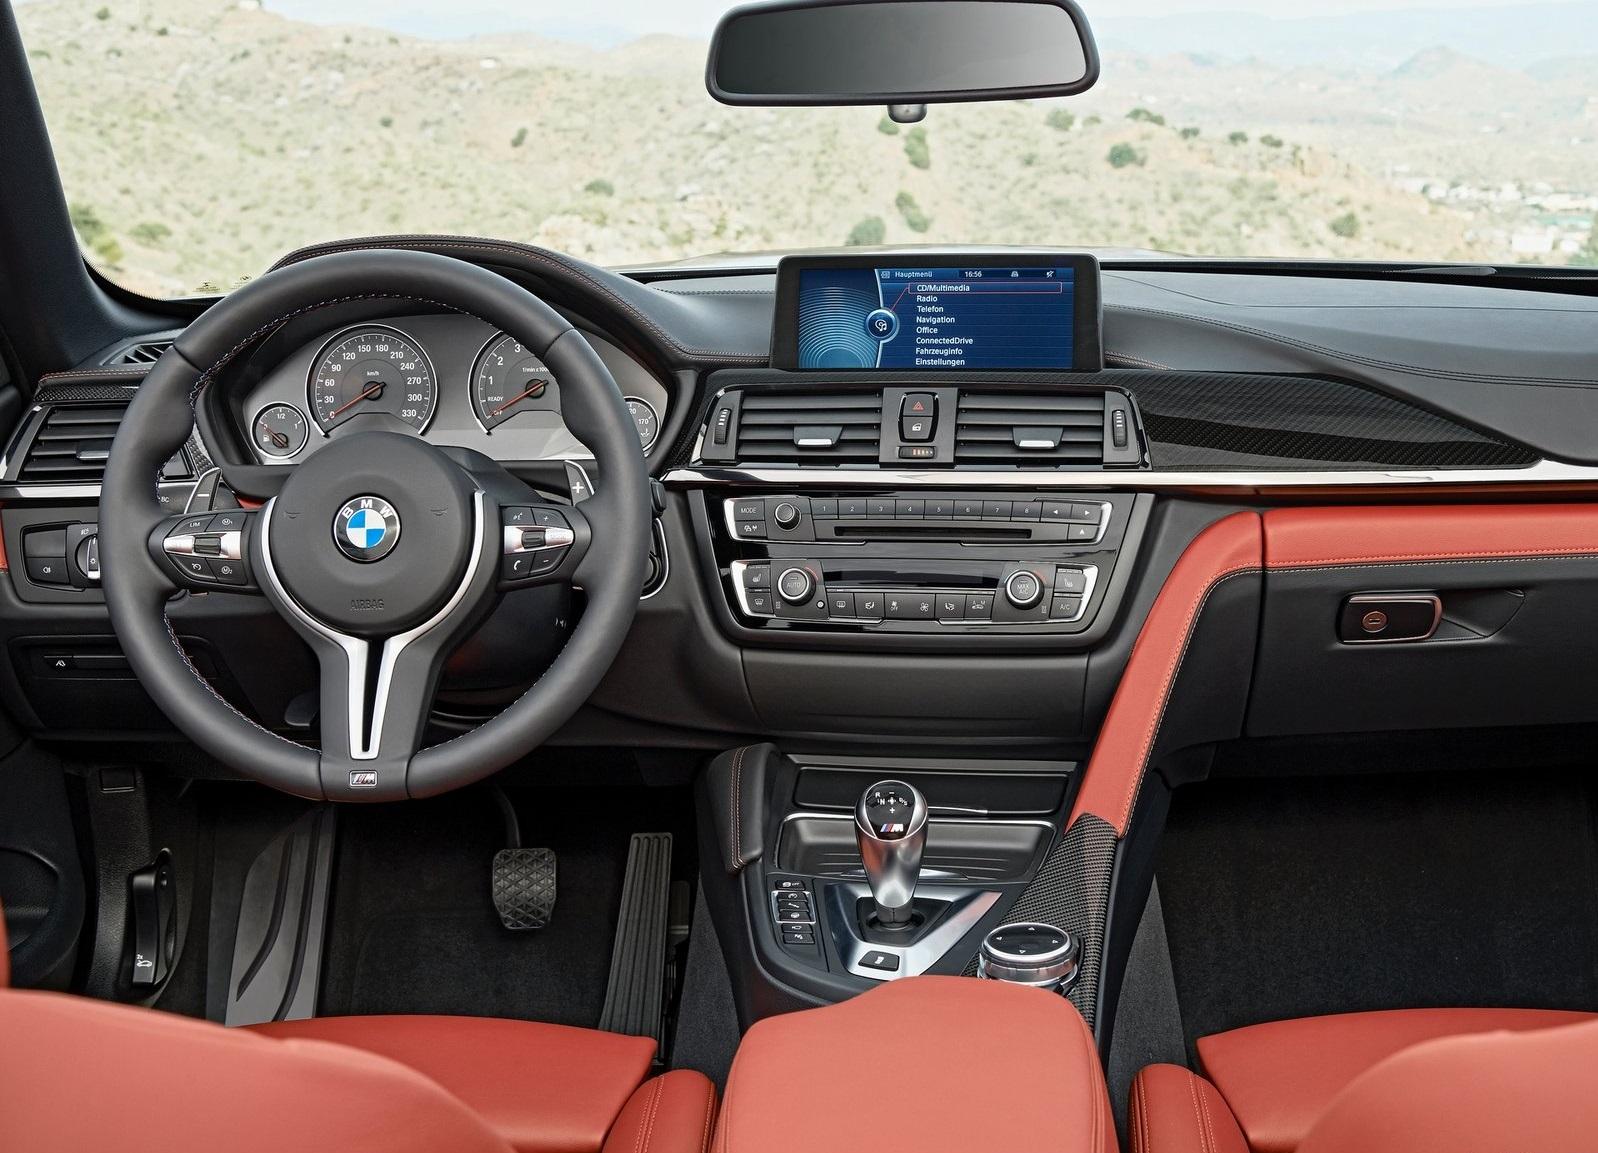 BMW M Convertible Interior Design In Detail Autoevolution - 2015 bmw m4 convertible price